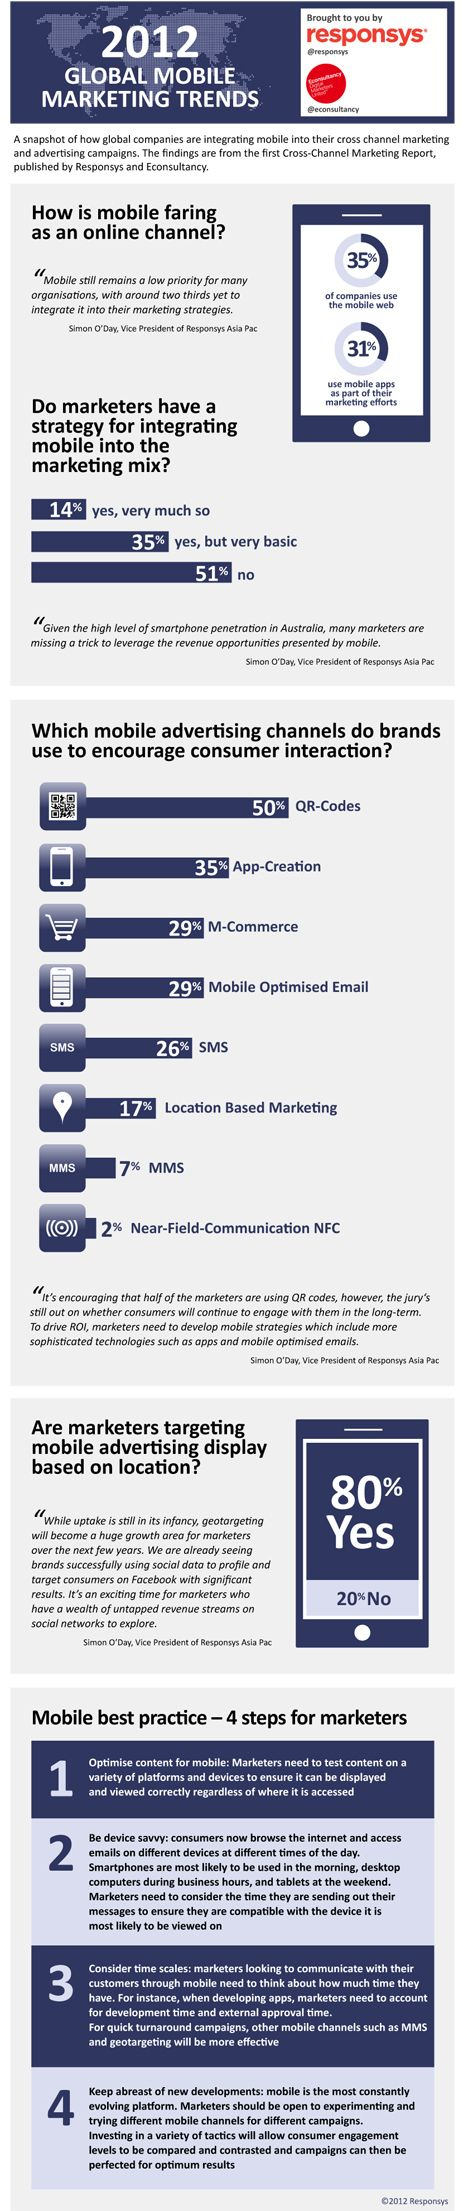 2012 Global #MobileMarketing Trends